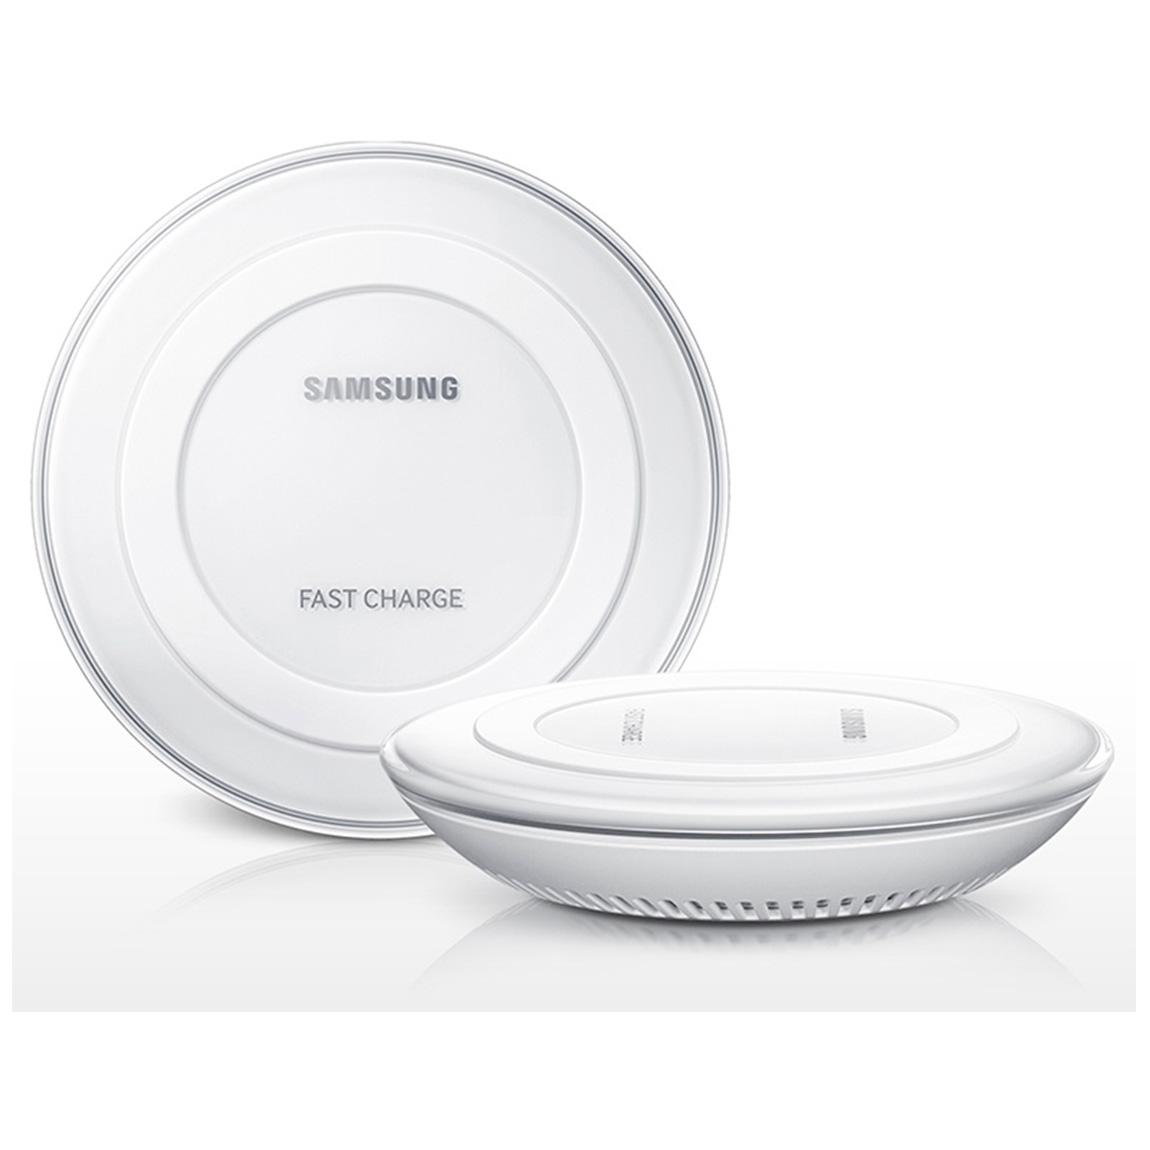 Original ασύρματος φορτιστής Samsung EP-PN920 - Blister